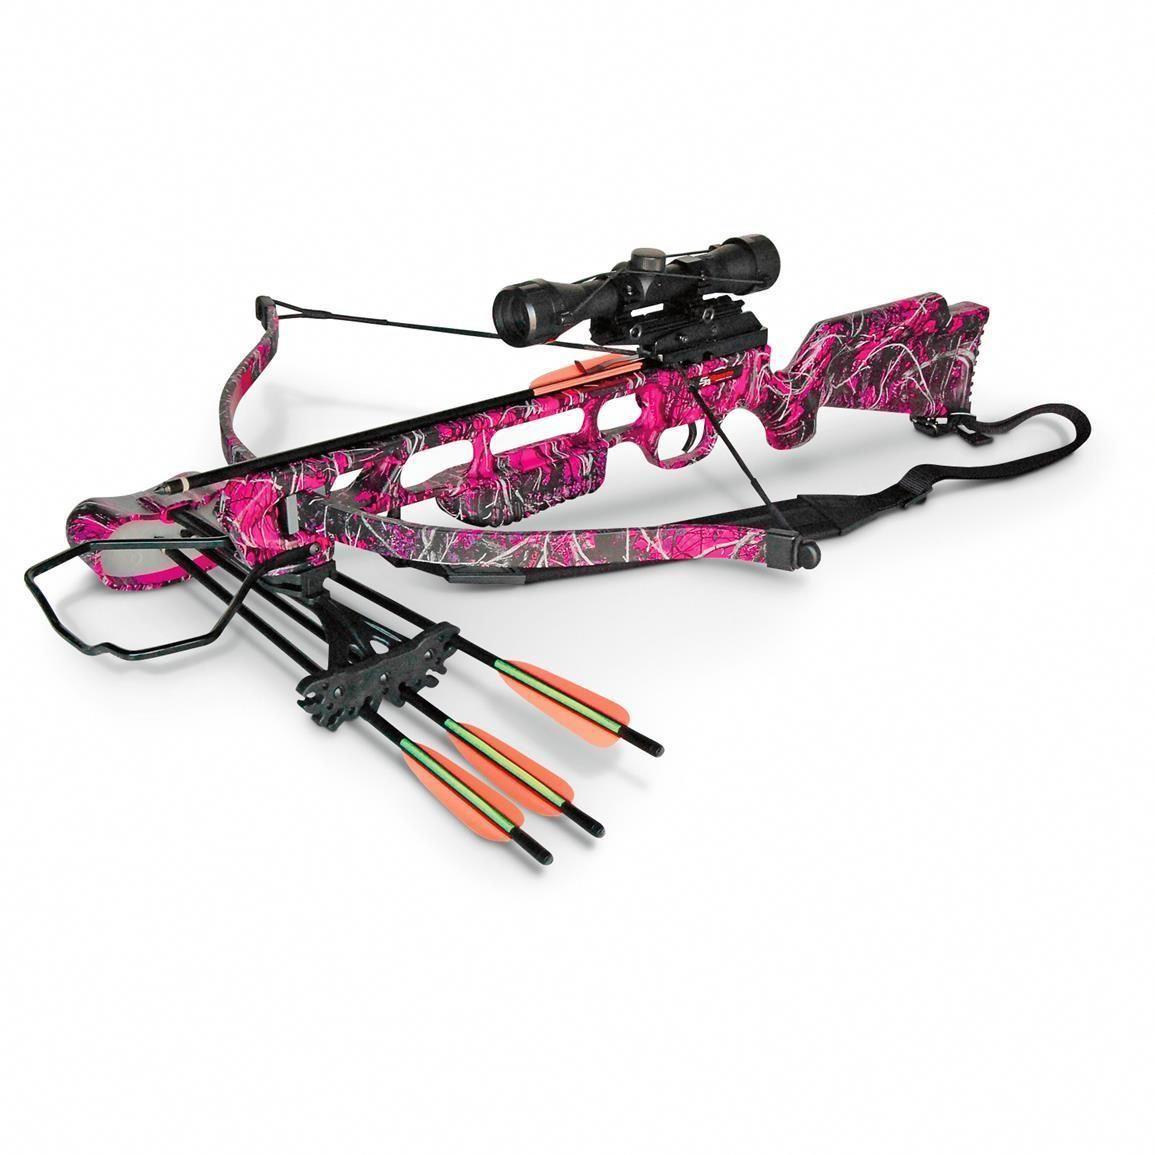 crossbow gear,crossbow rack,crossbow target,crossbow